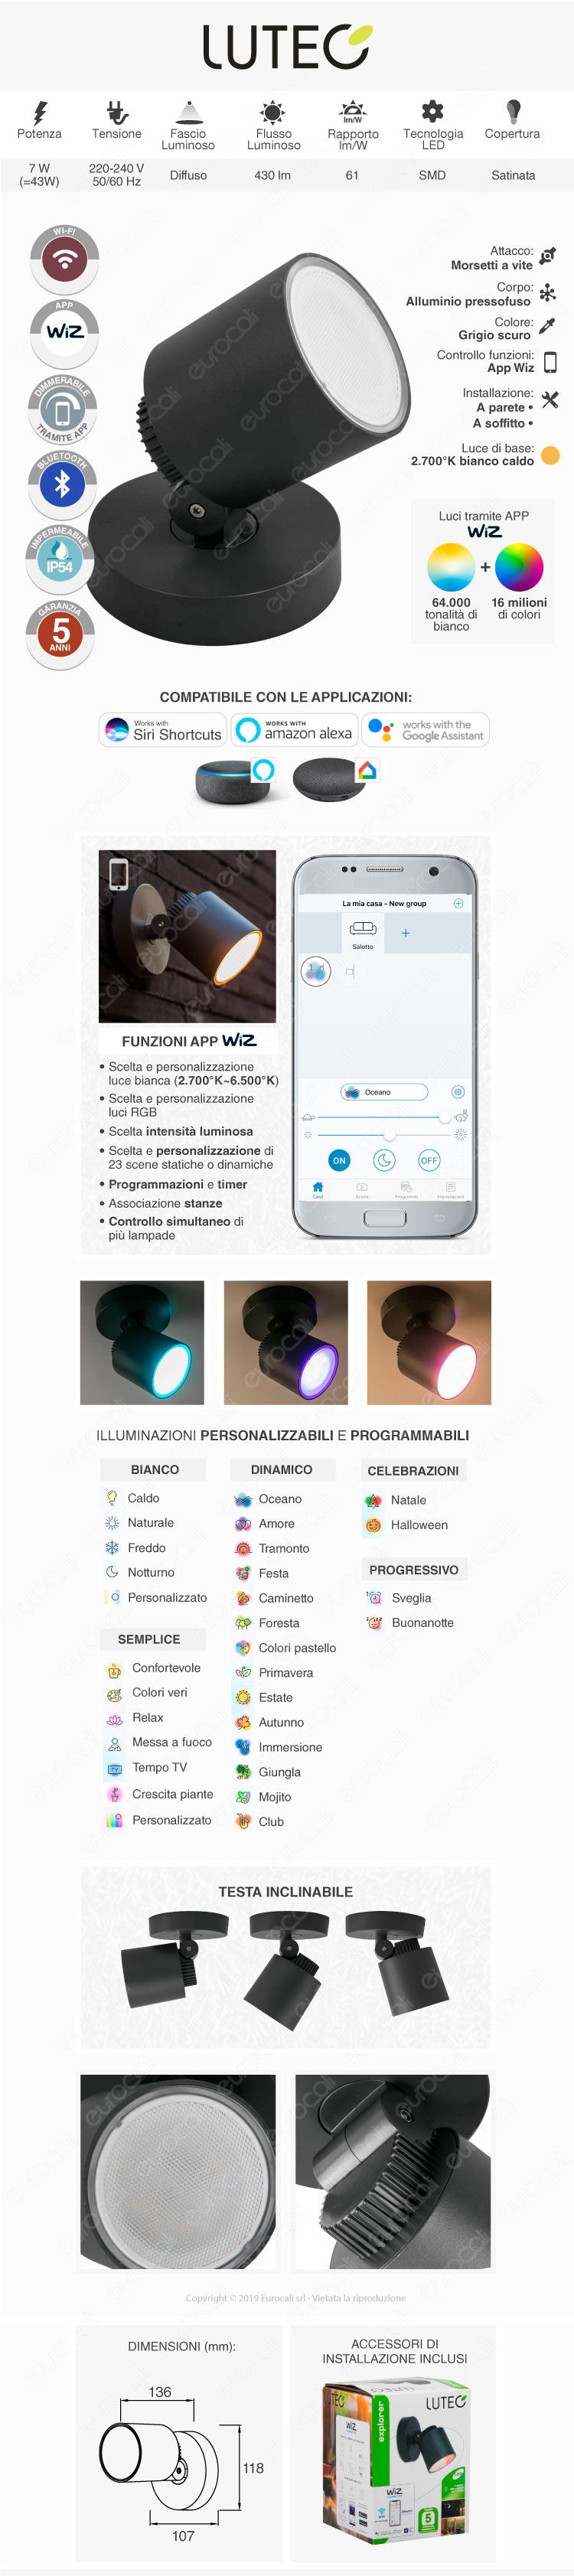 Lampada LED da Muro Inclinabile Lutec Explorer 7W RGB+W 3in1 WiFi IP54